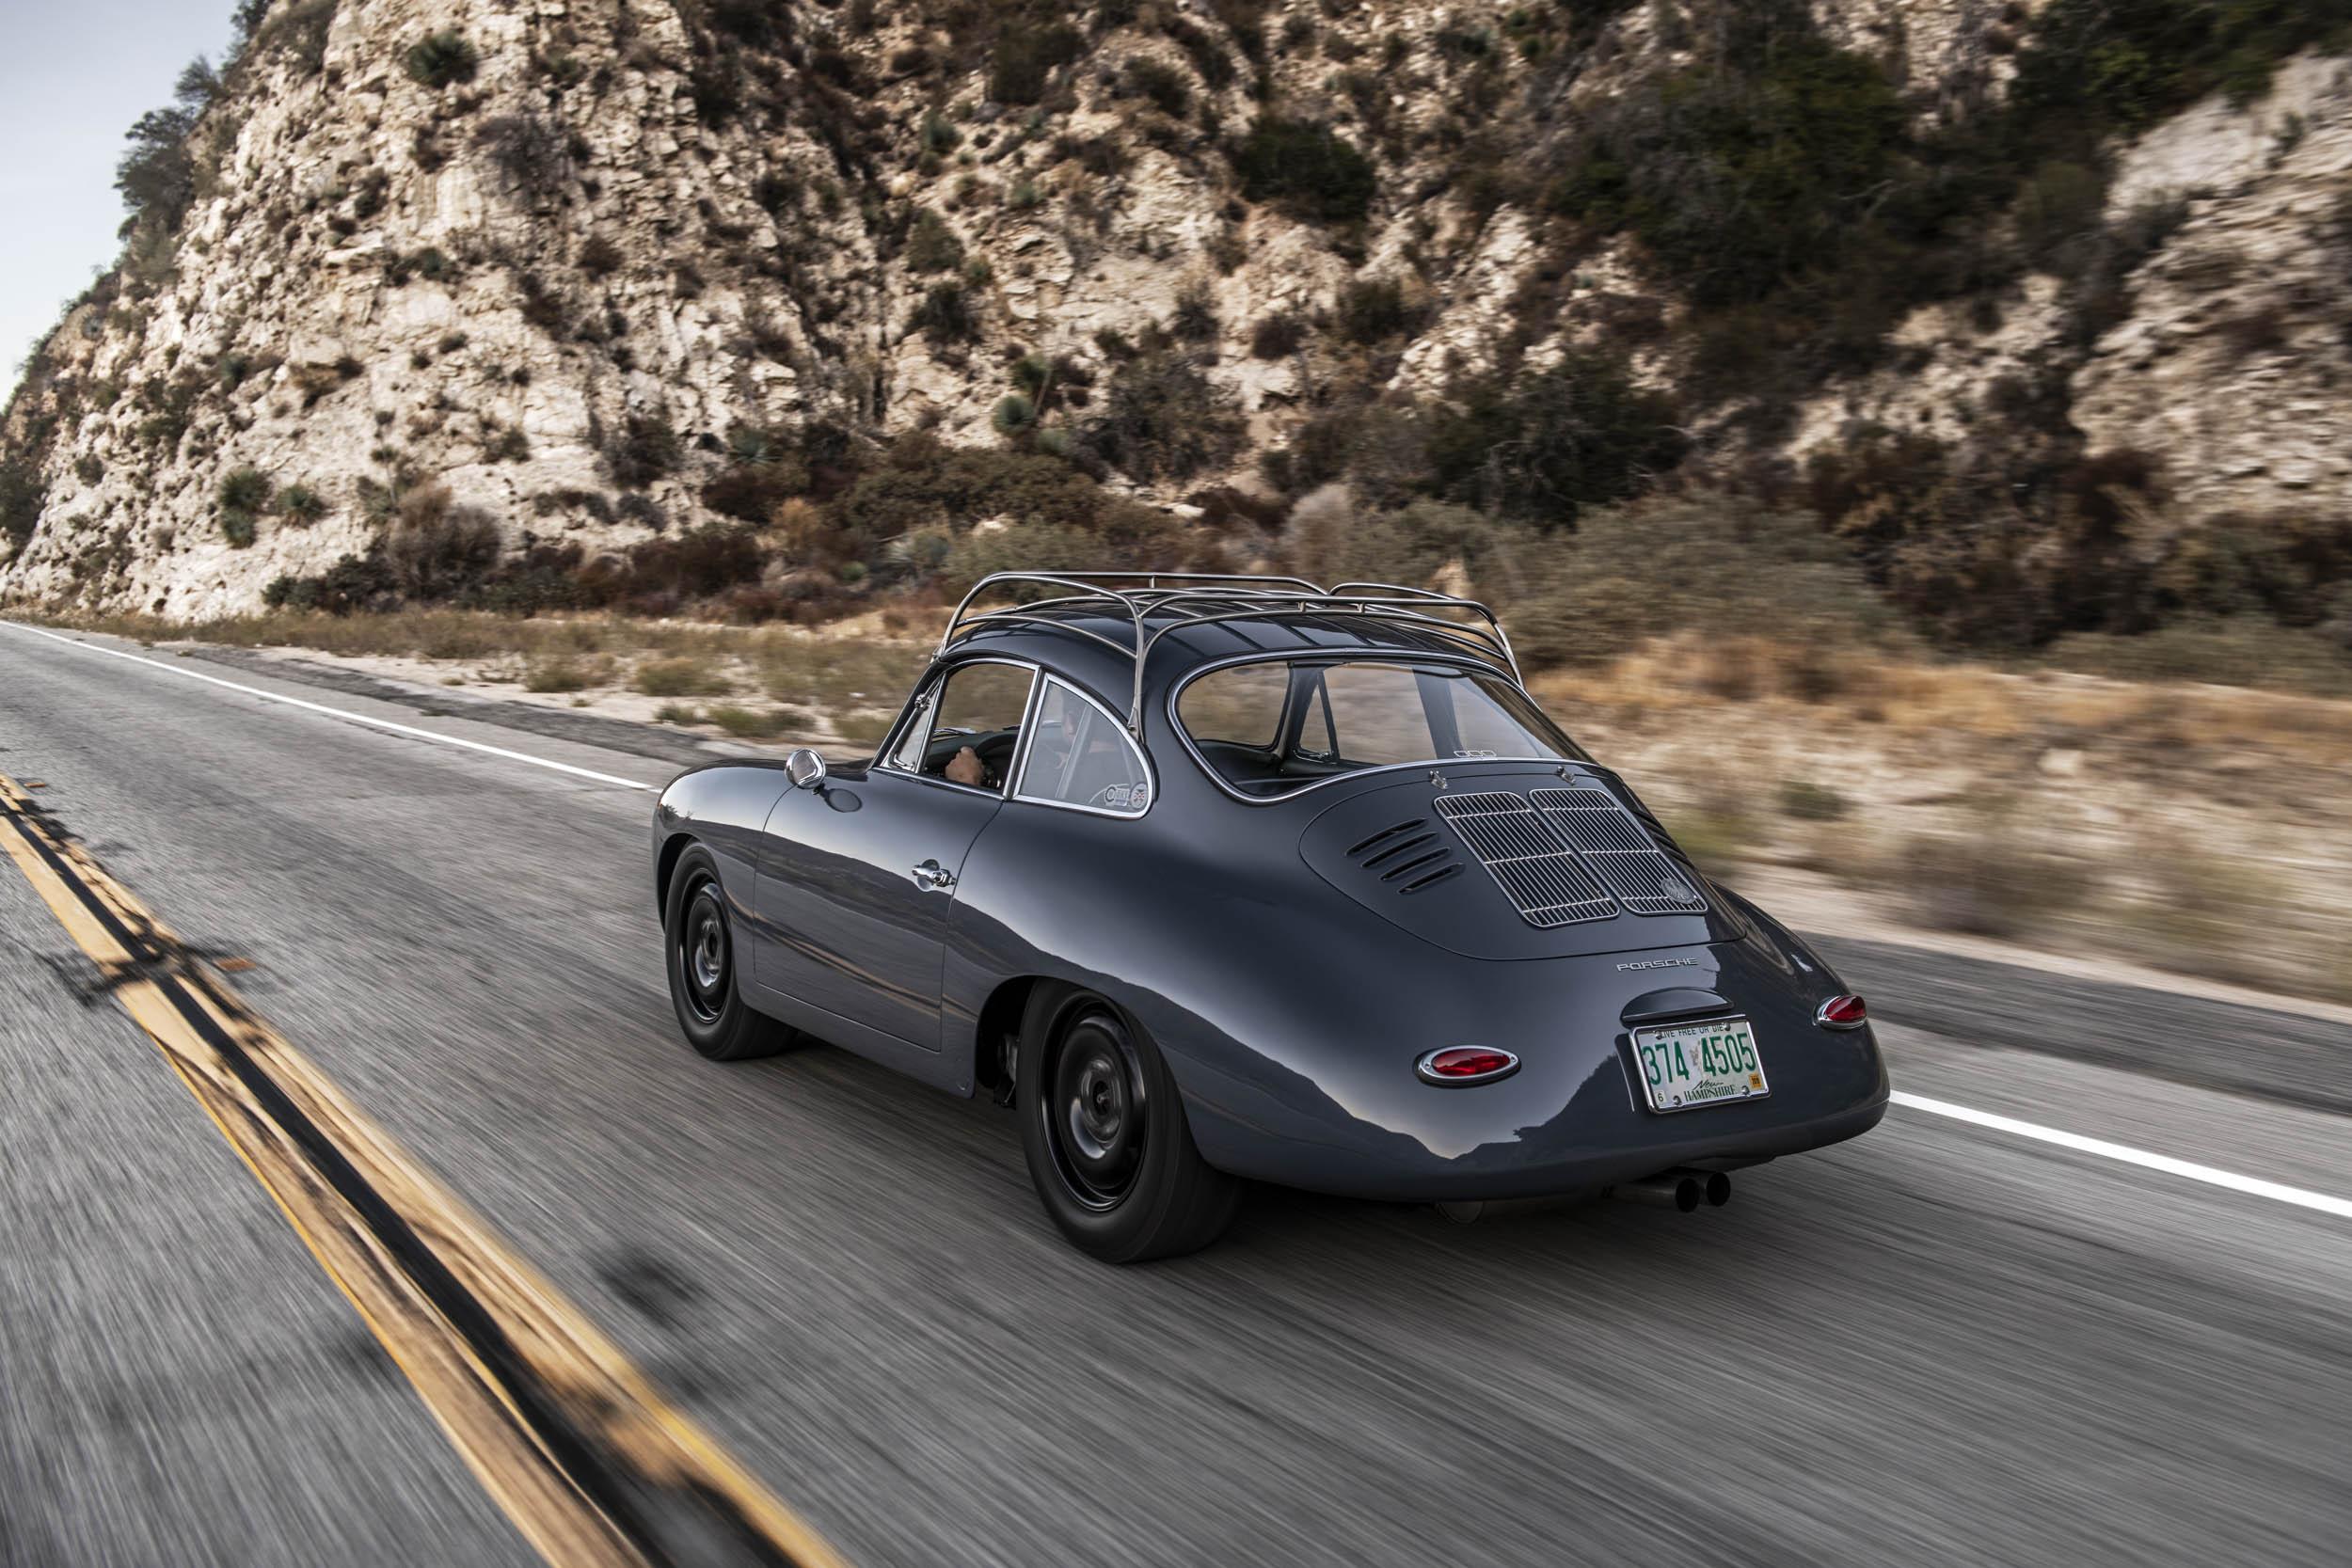 Emory Porsche 356 C4S Allrad driving rear 3/4